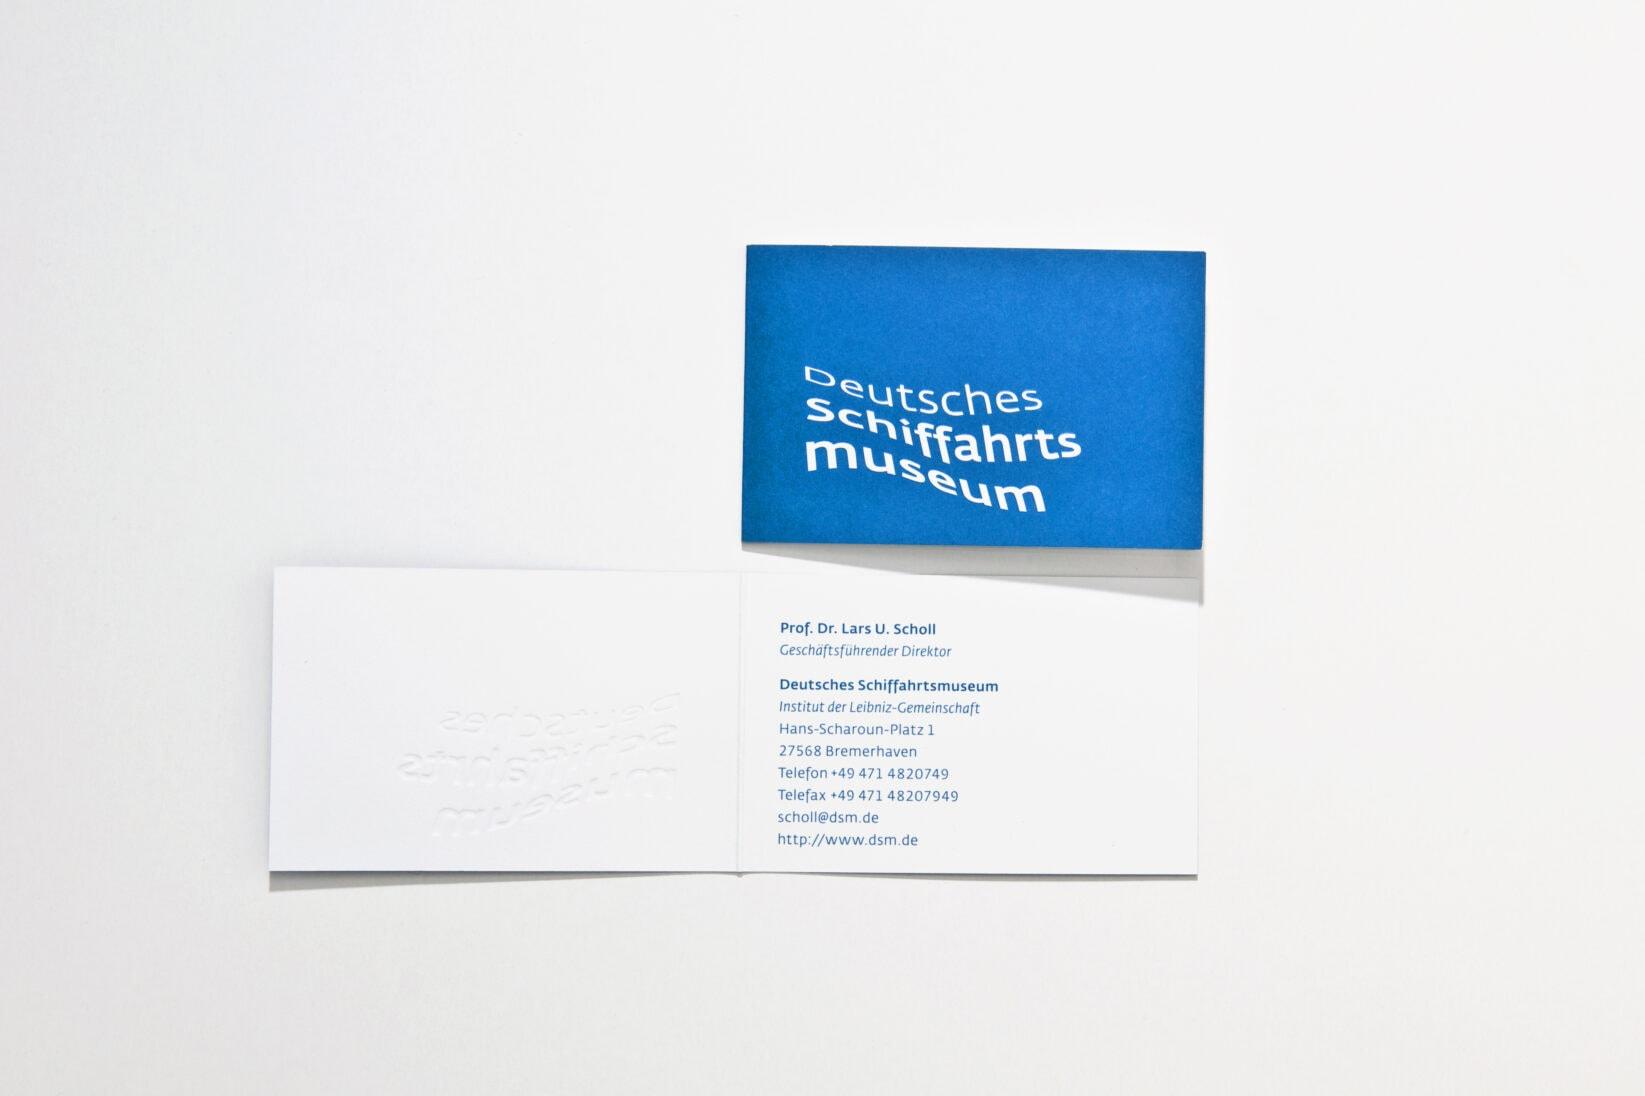 Corporate Identity DSM Visitenkarte stationery blau Logo Wortmarke